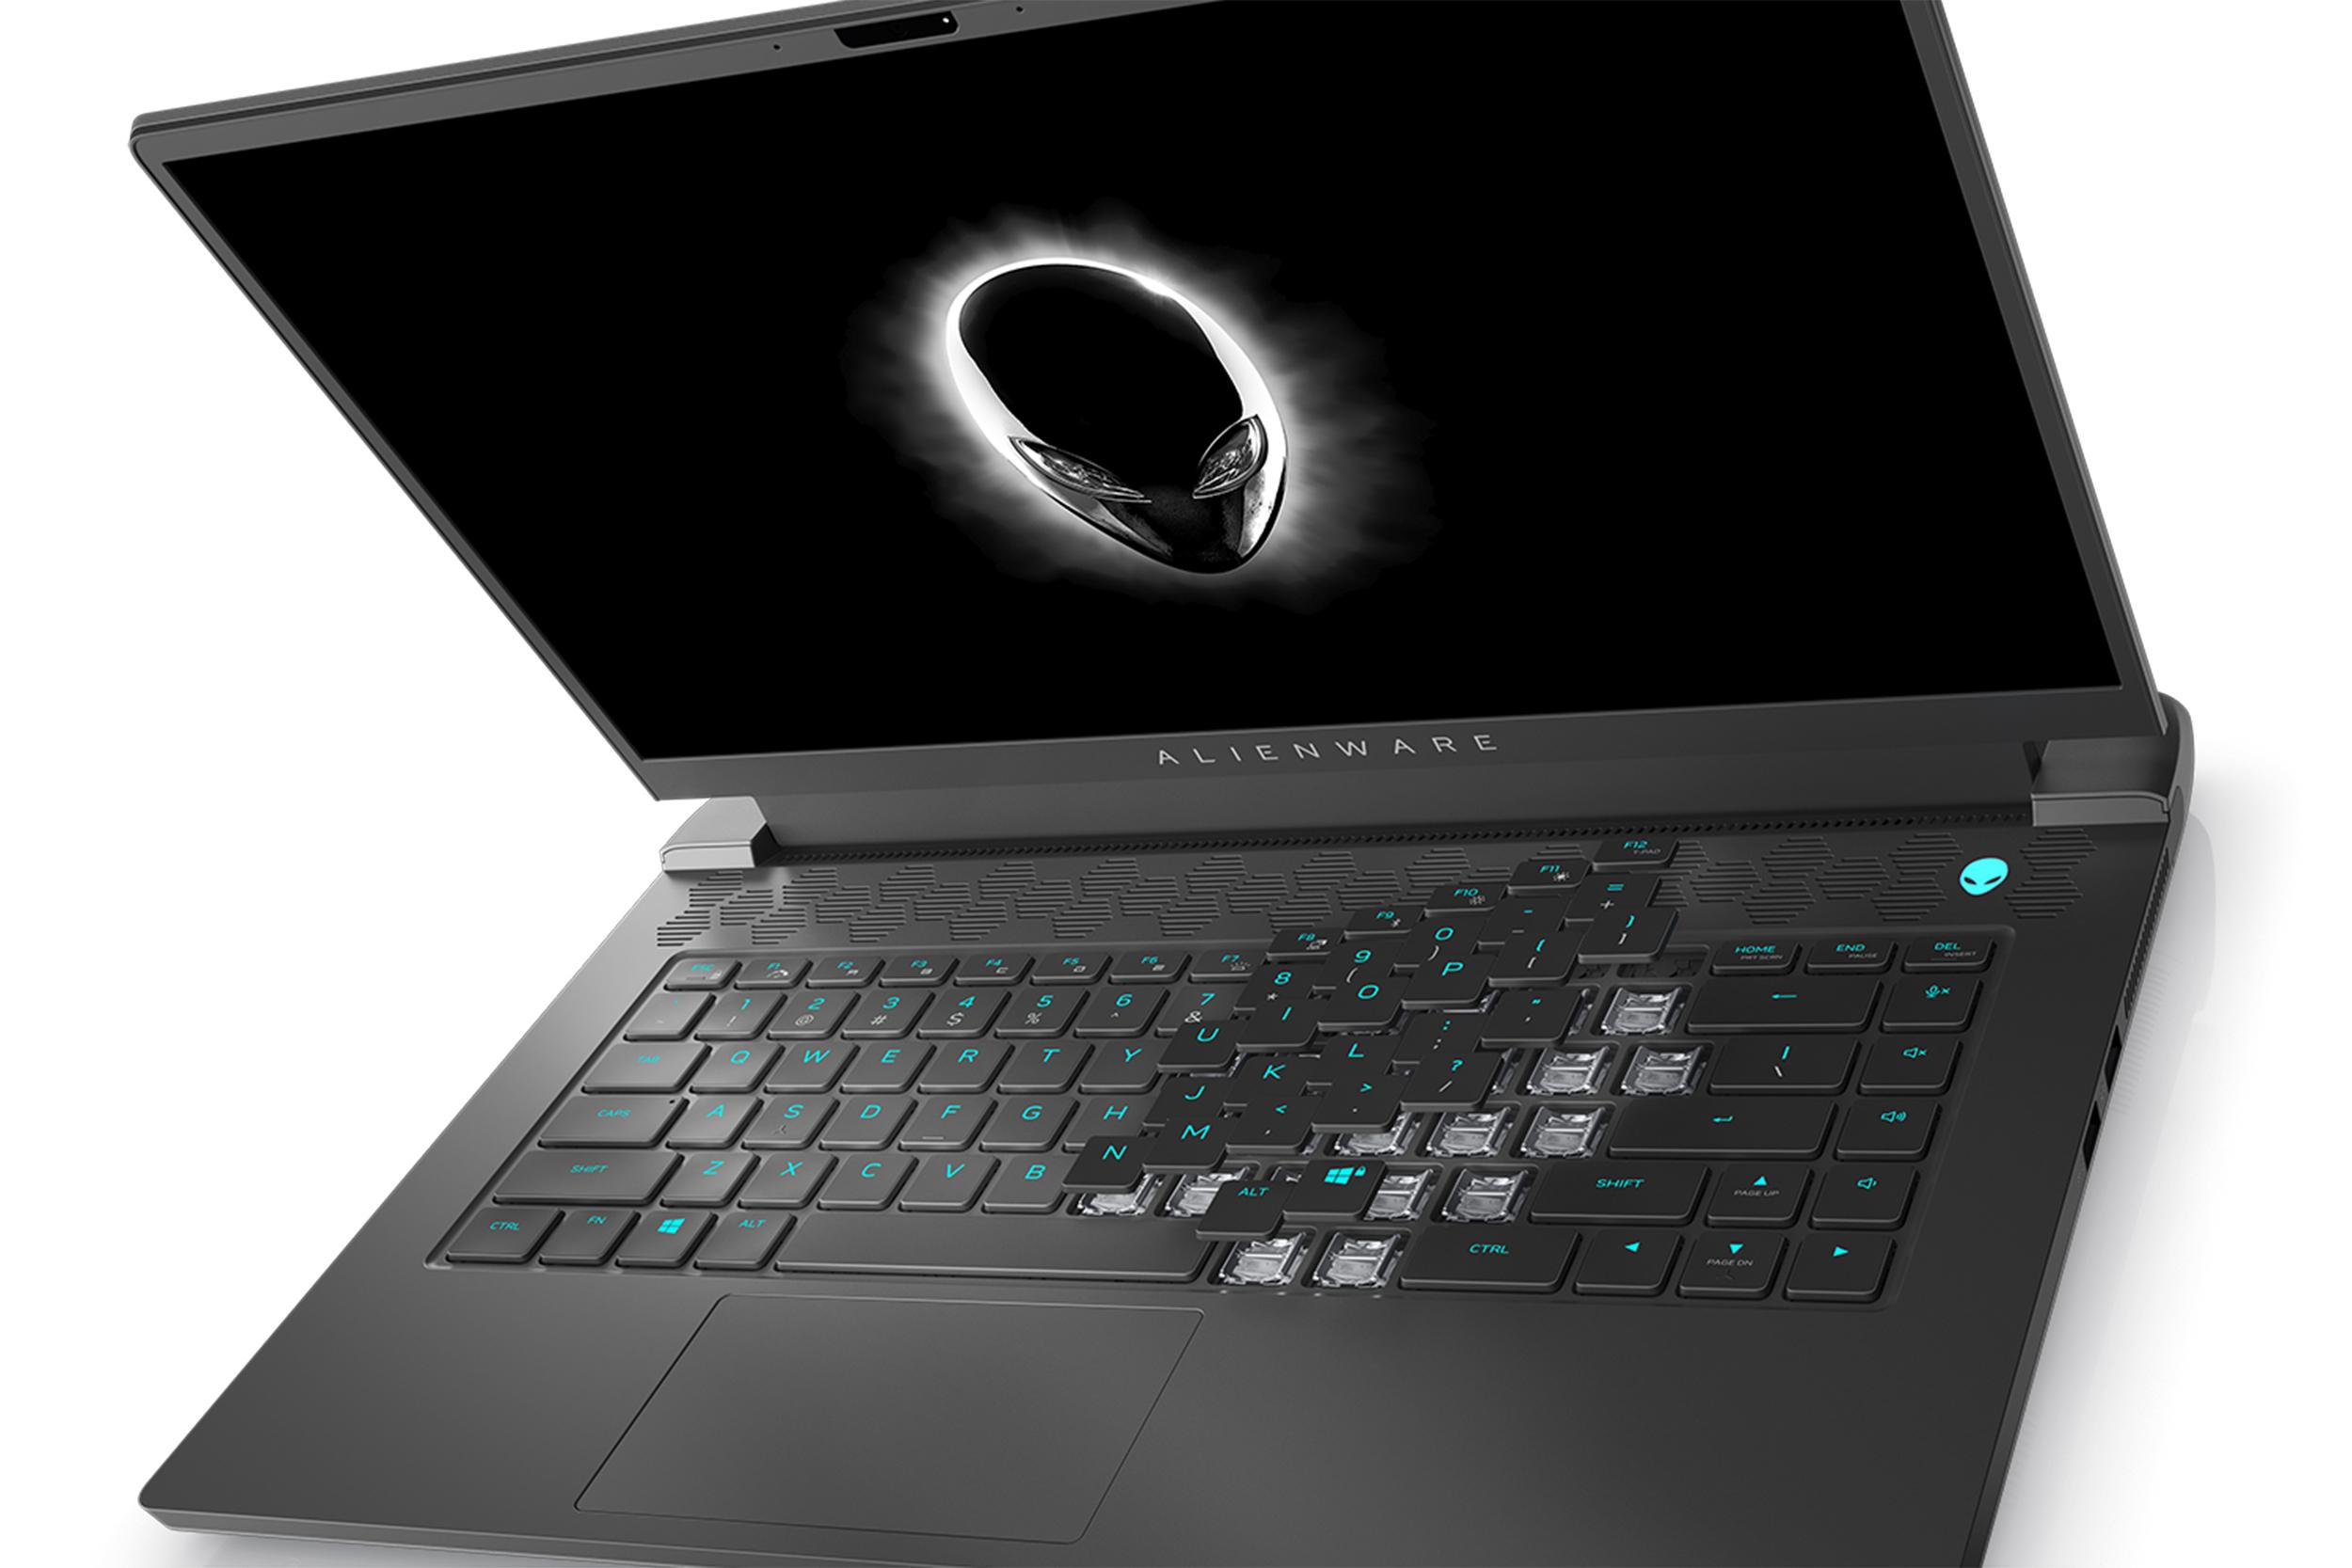 Alienware представила первый за 14 лет ноутбук на базе процессора AMD